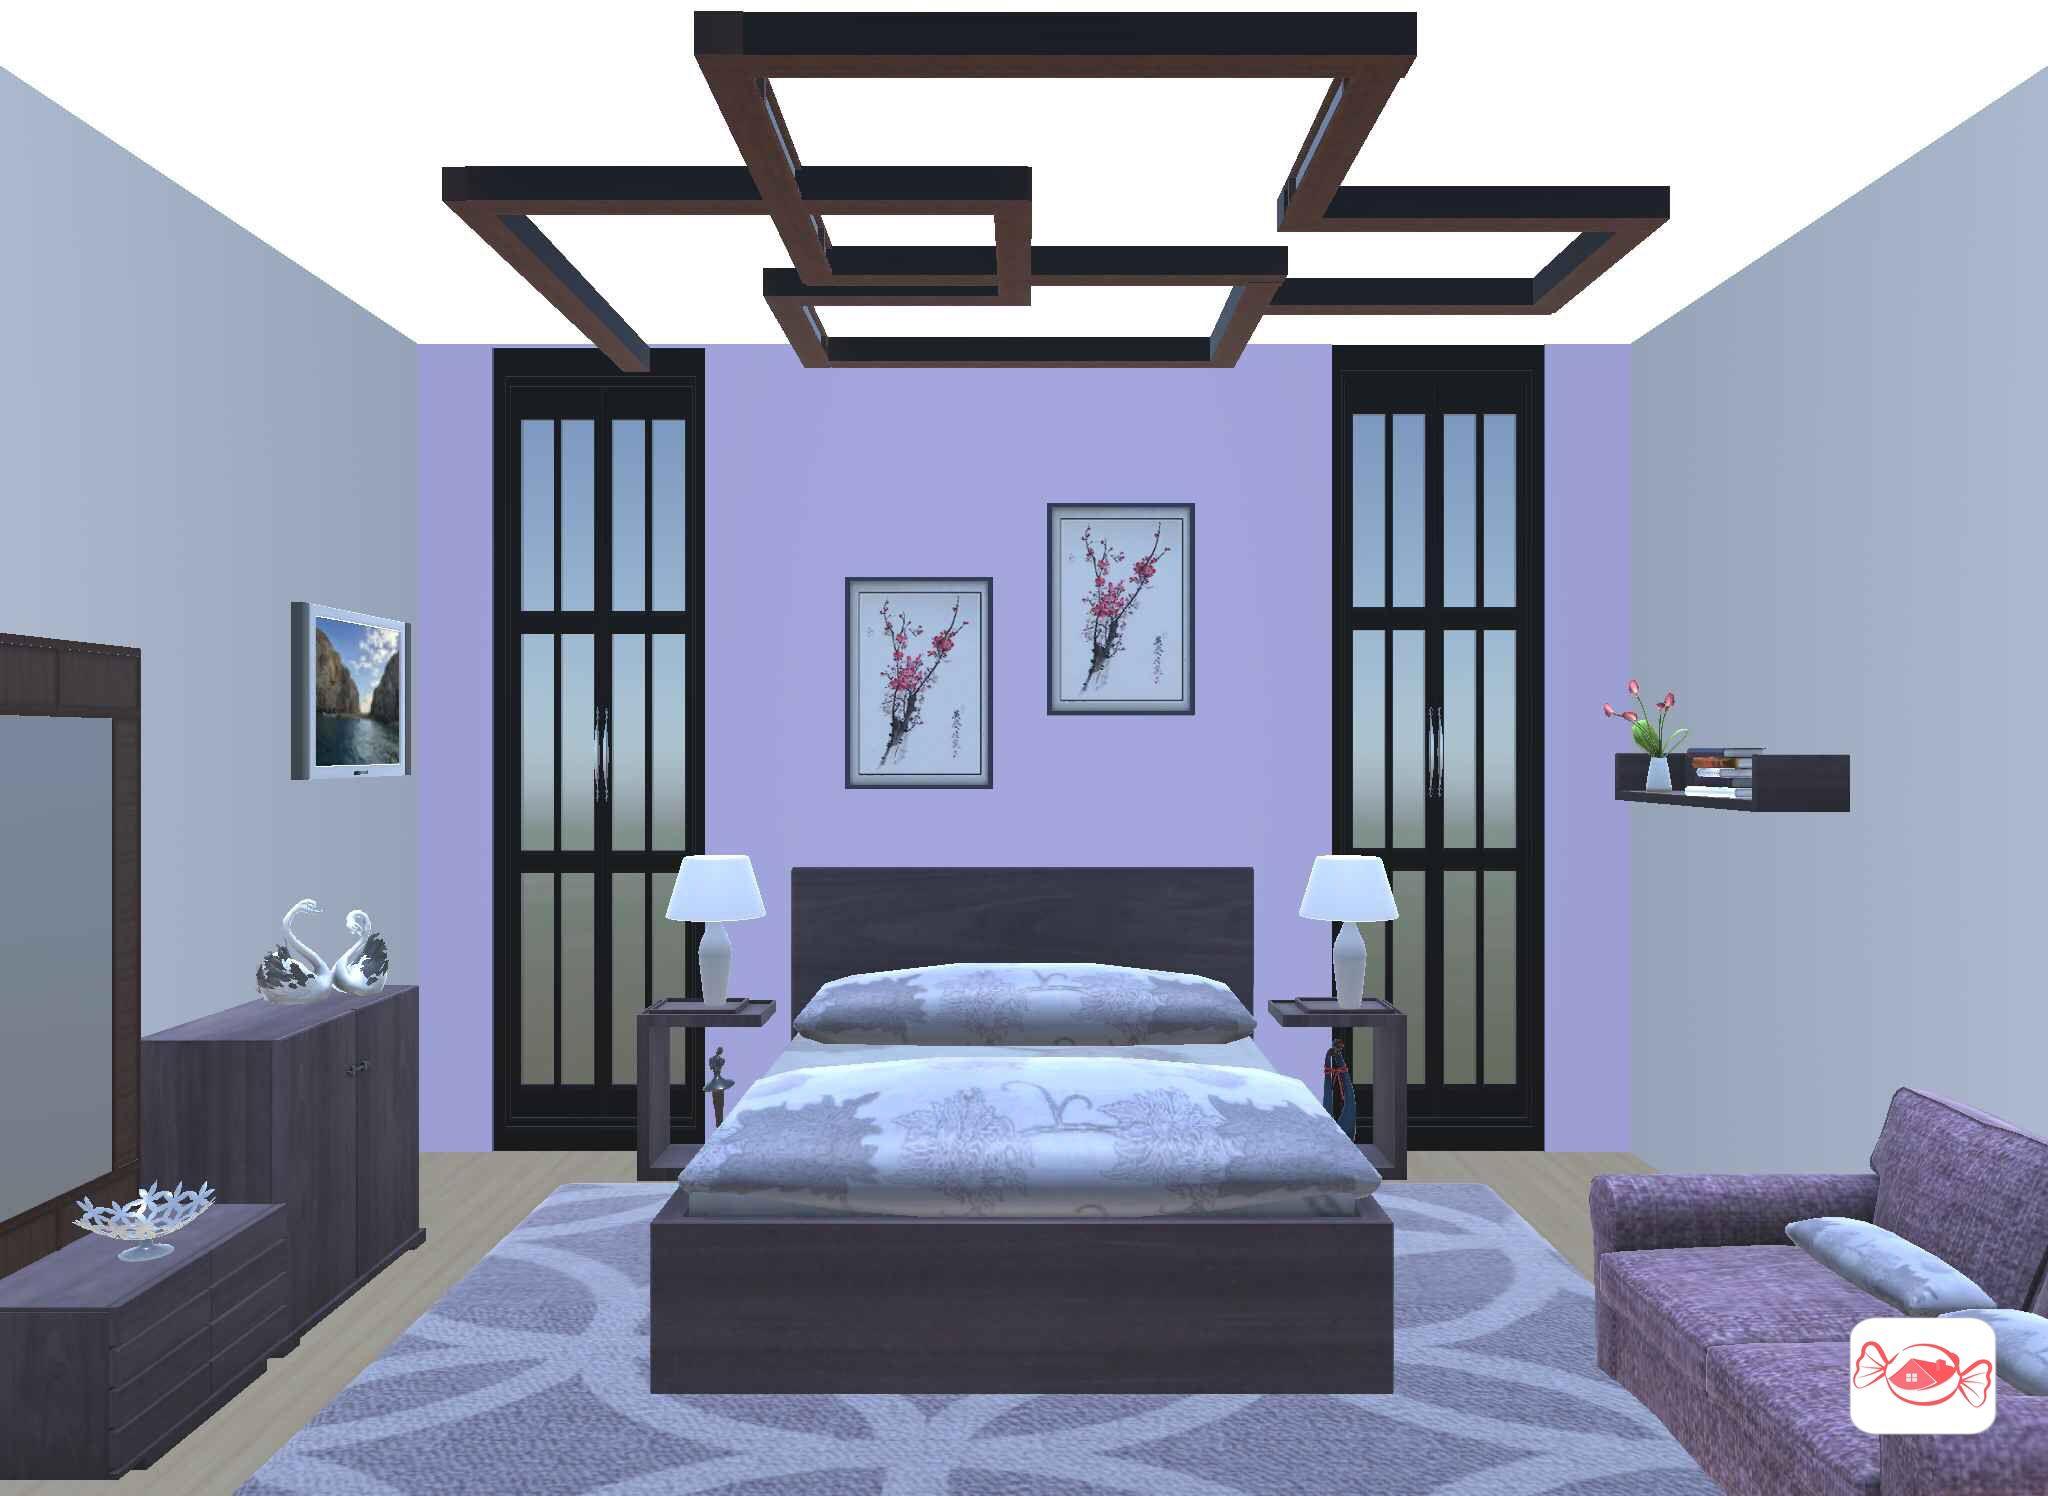 Bedroom Contemporary Bedroom Design Bedroom Design Purple Bedroom Design Bedroom design online 3d